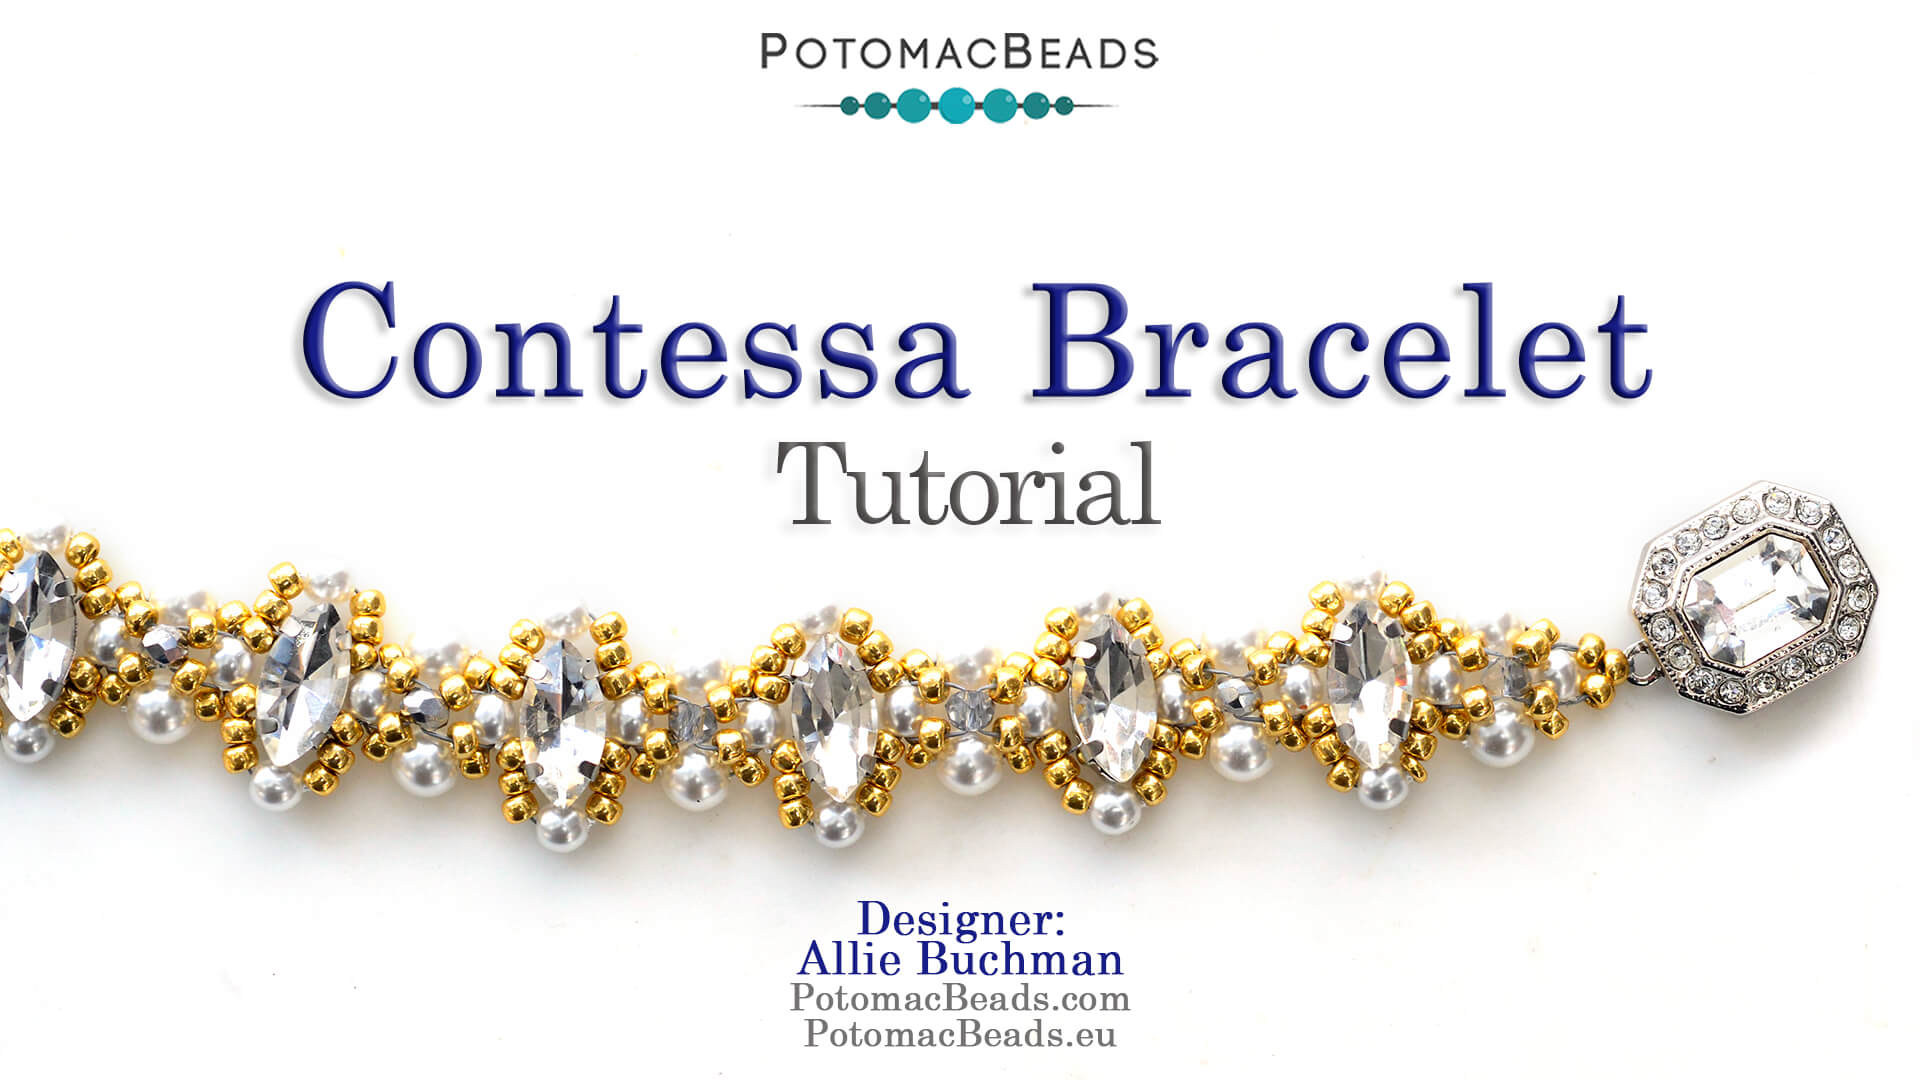 How to Bead Jewelry / Beading Tutorials & Jewel Making Videos / Right Angle Weave (RAW) Videos / Contessa Bracelet Tutorial